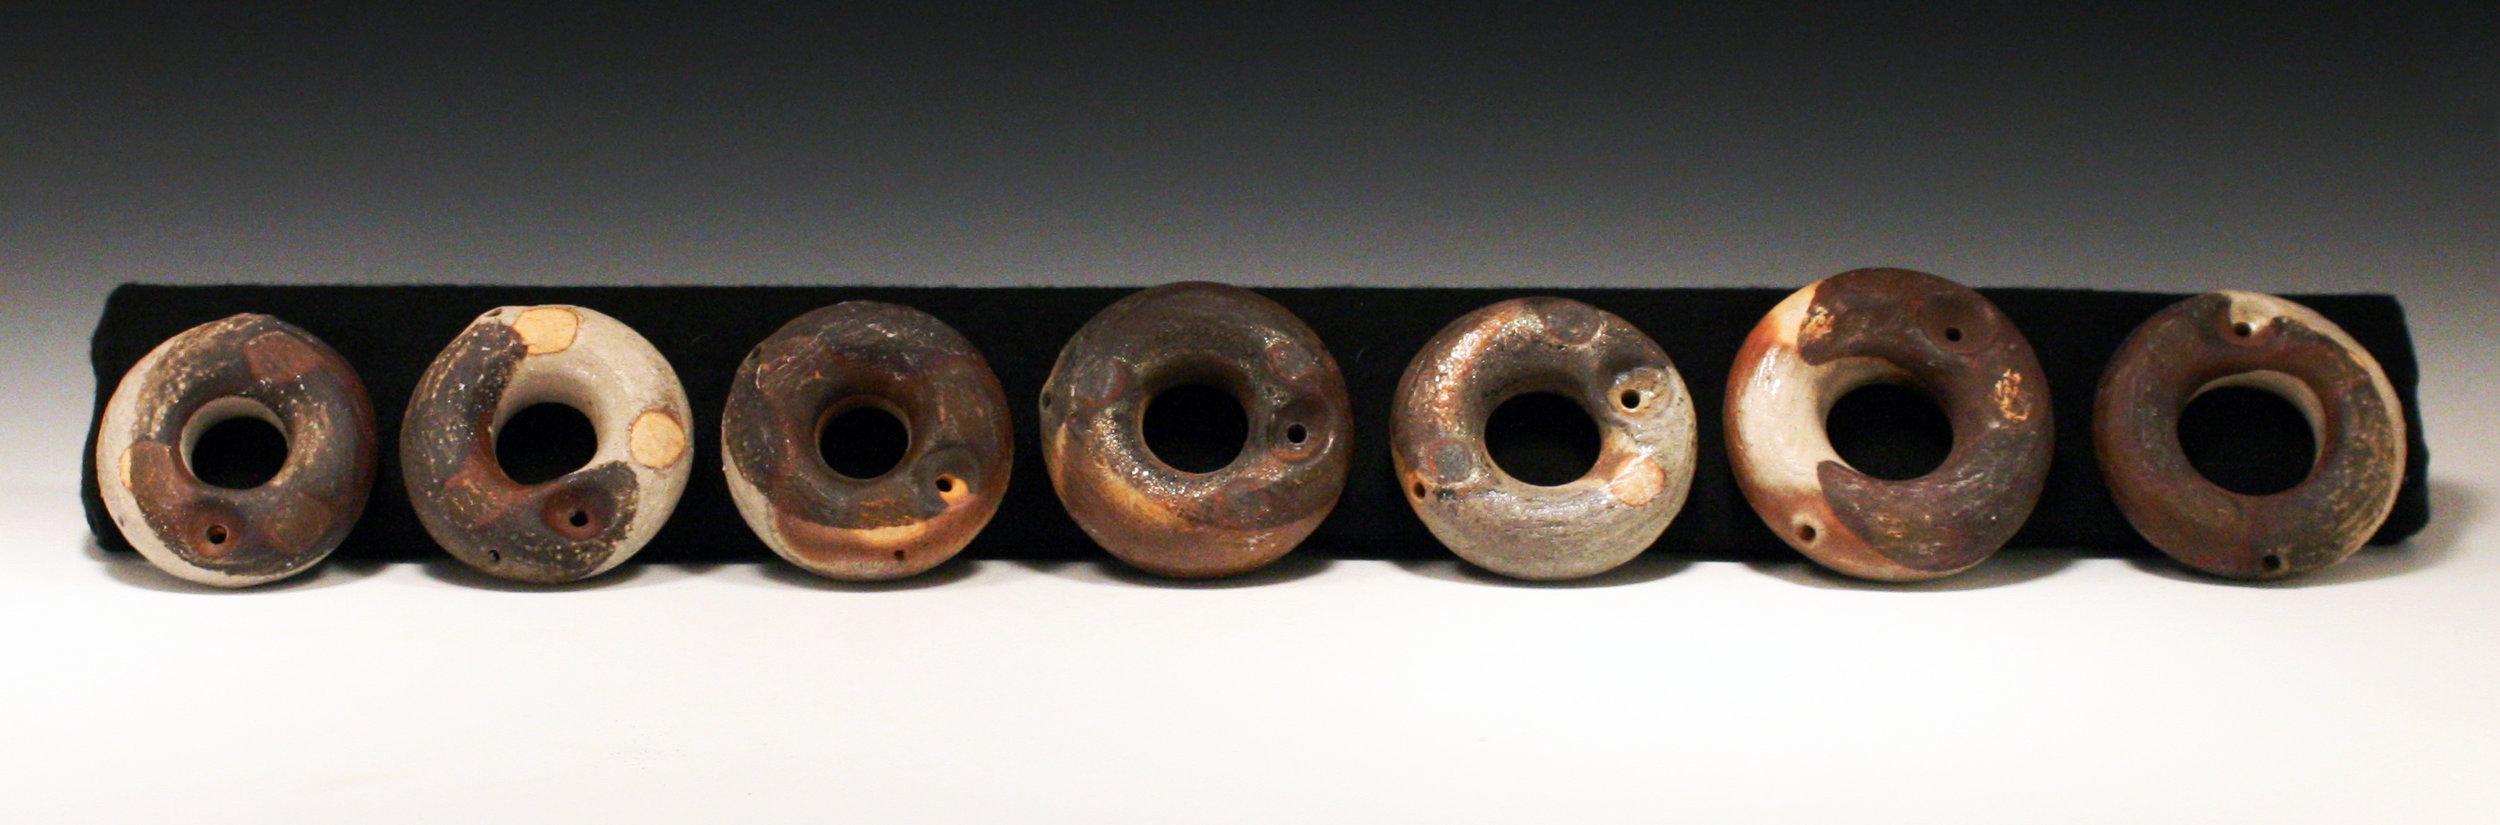 donut pipes 1.jpg